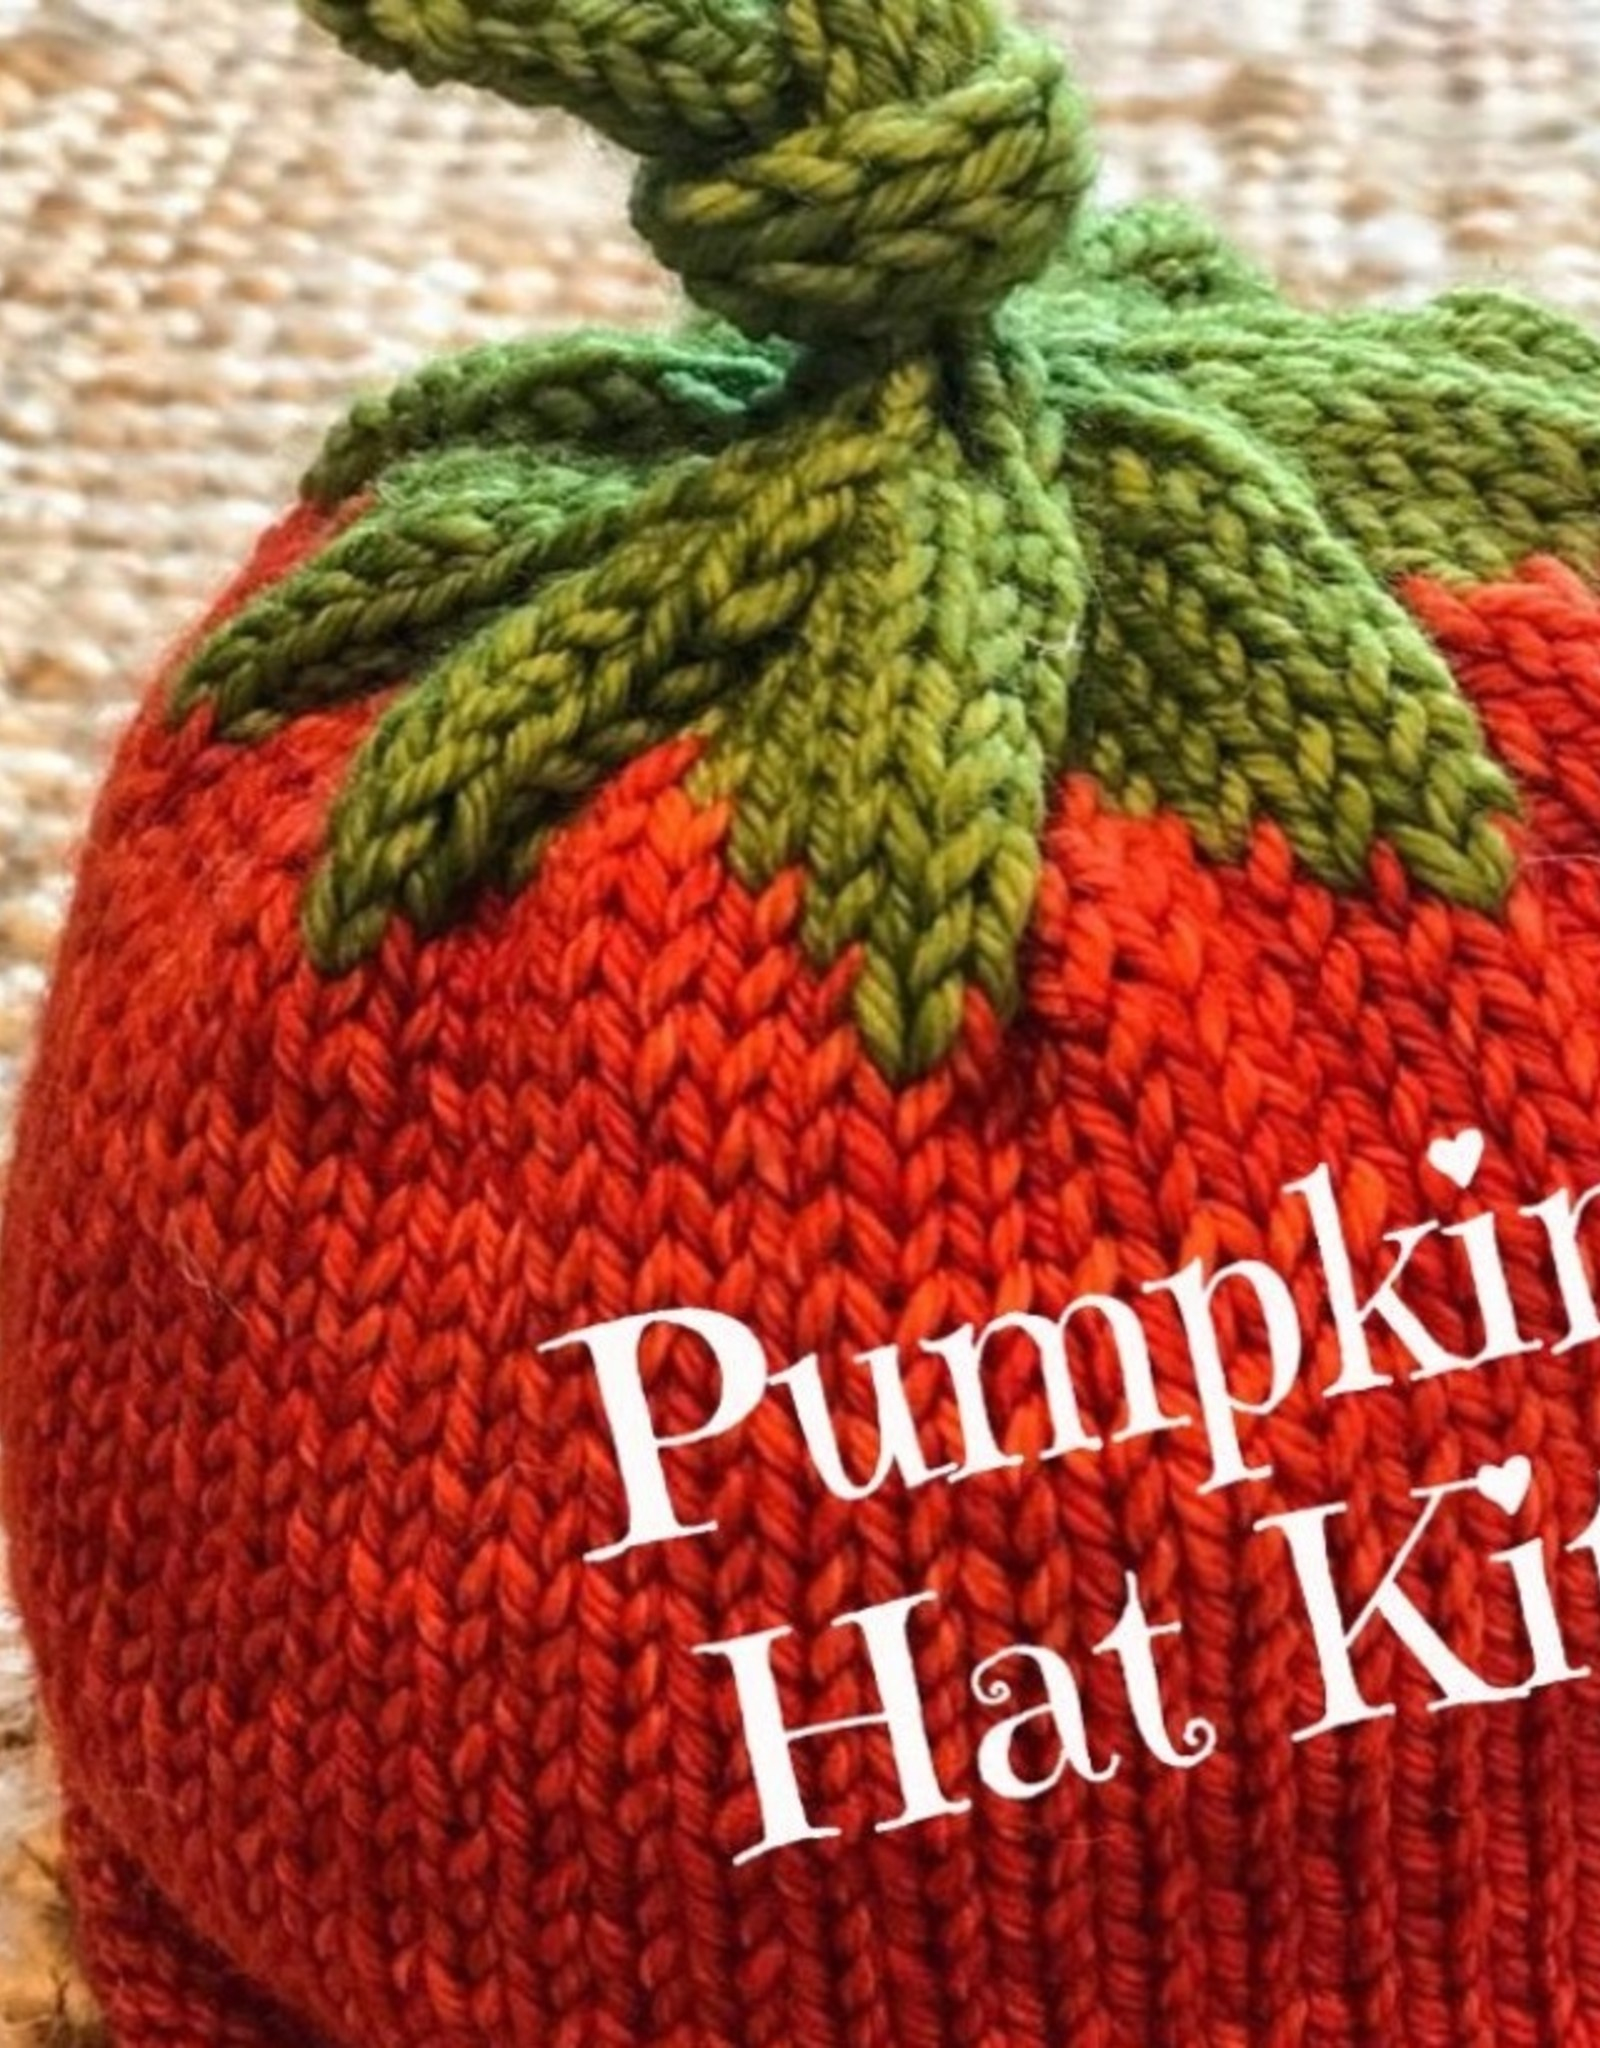 Emma's Yarn CCY-Pumpkin Hat Kit